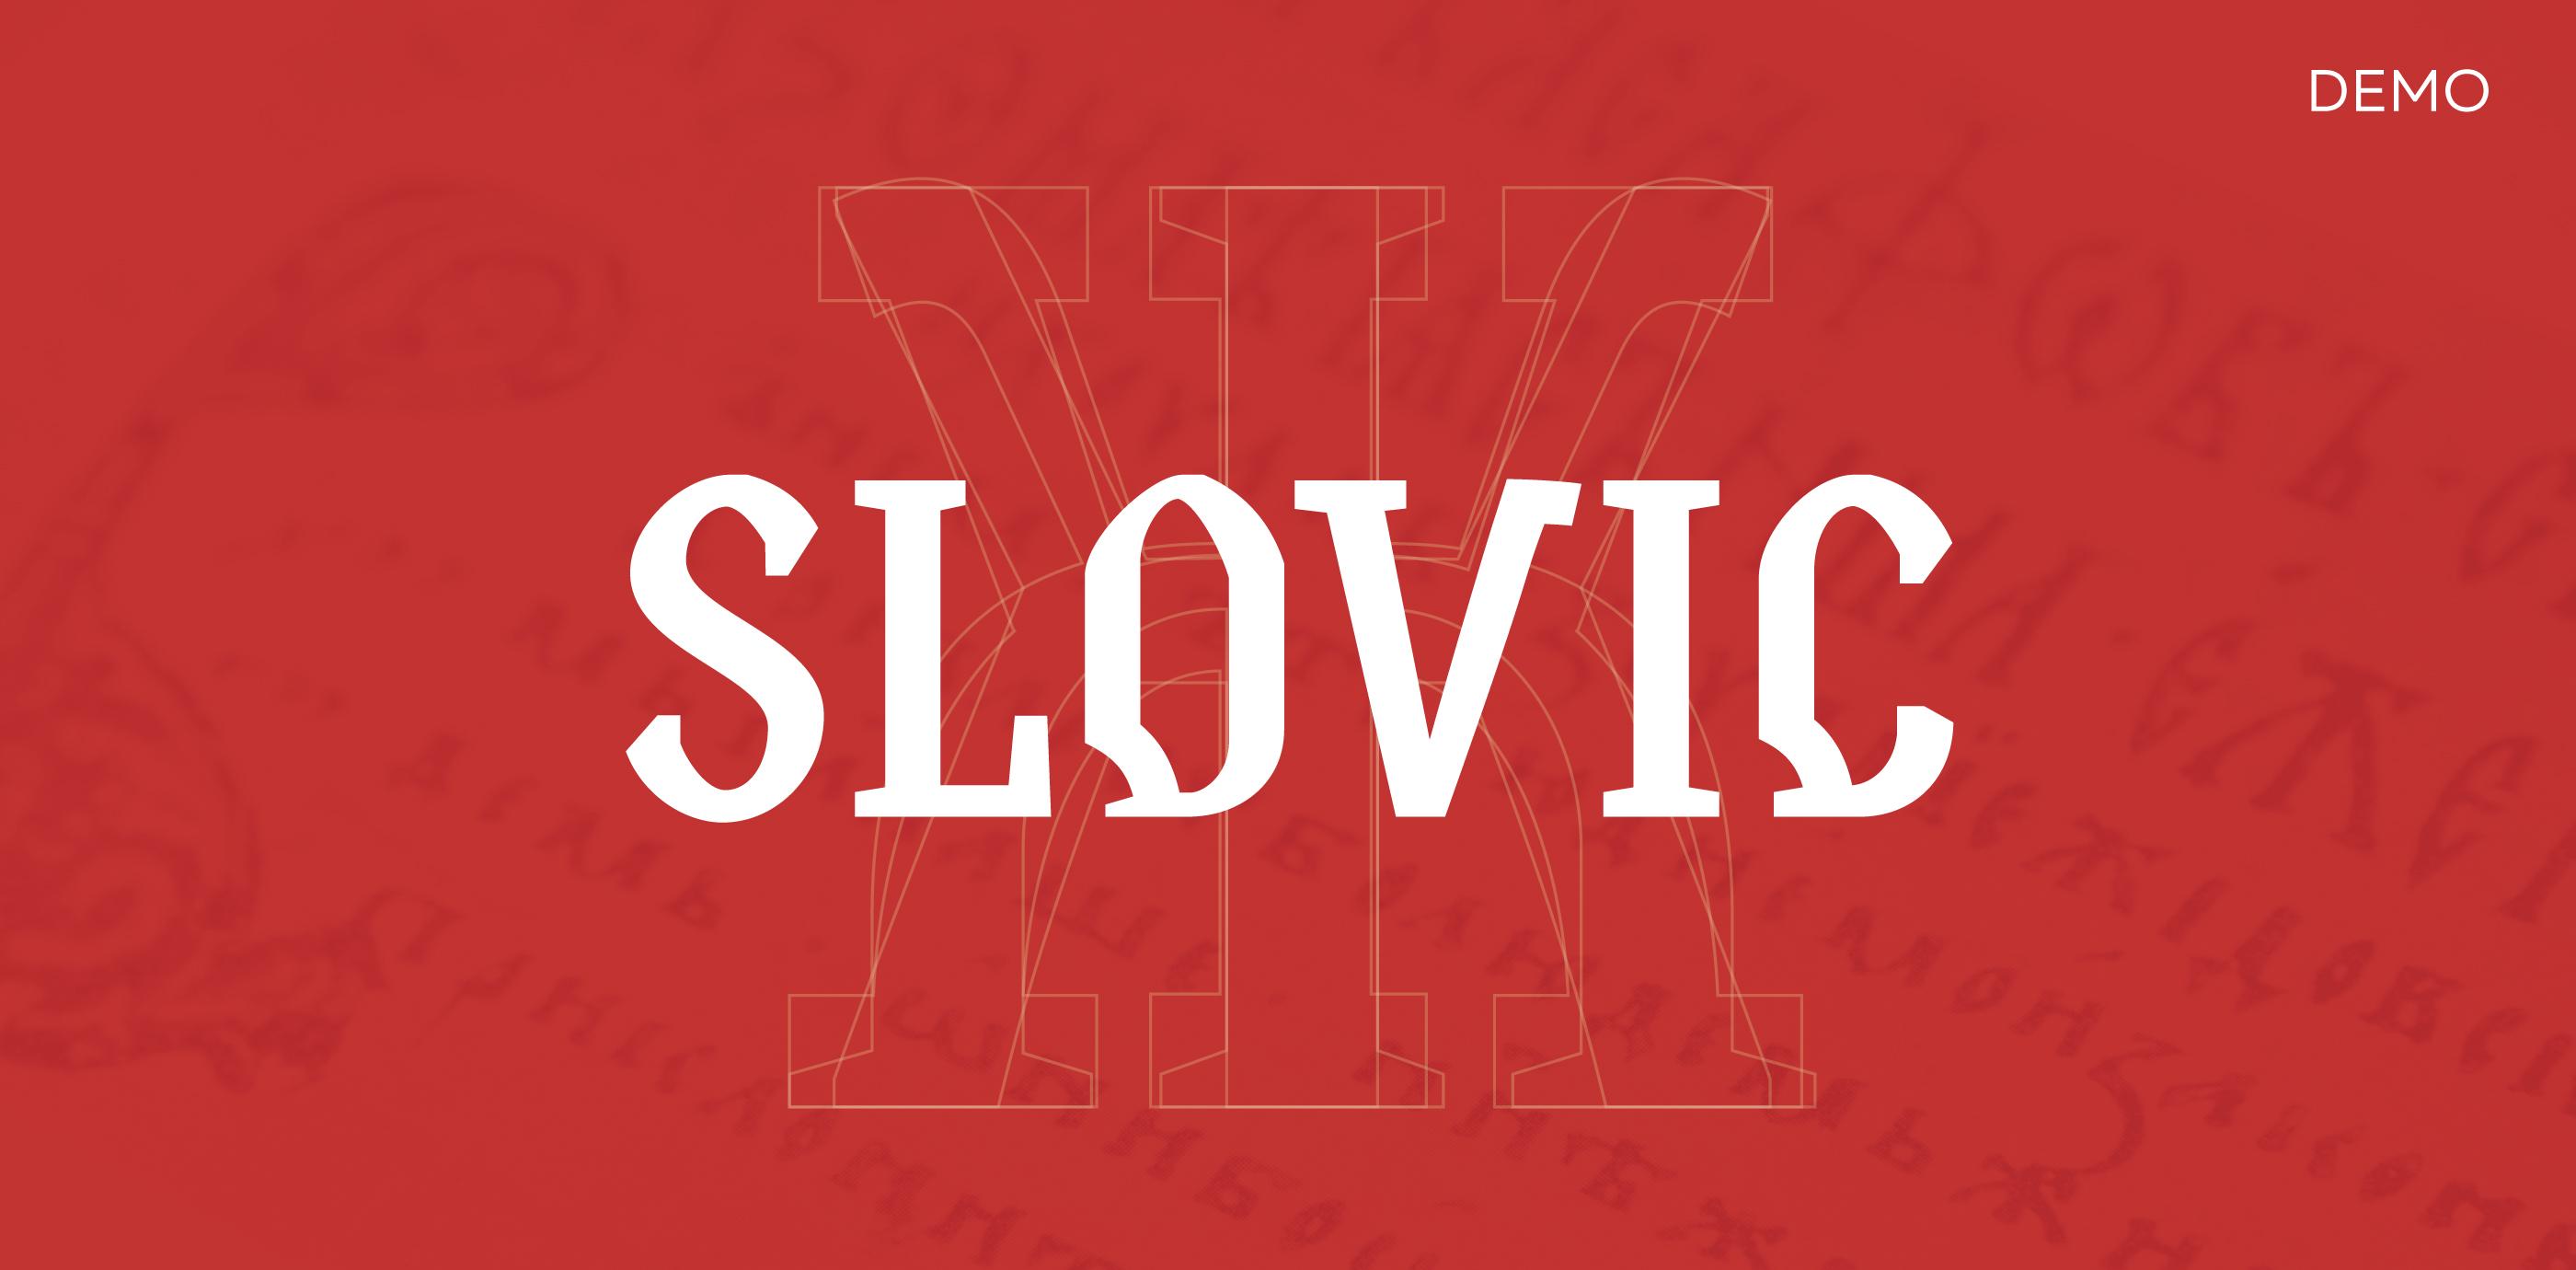 slovic-cs1@2x